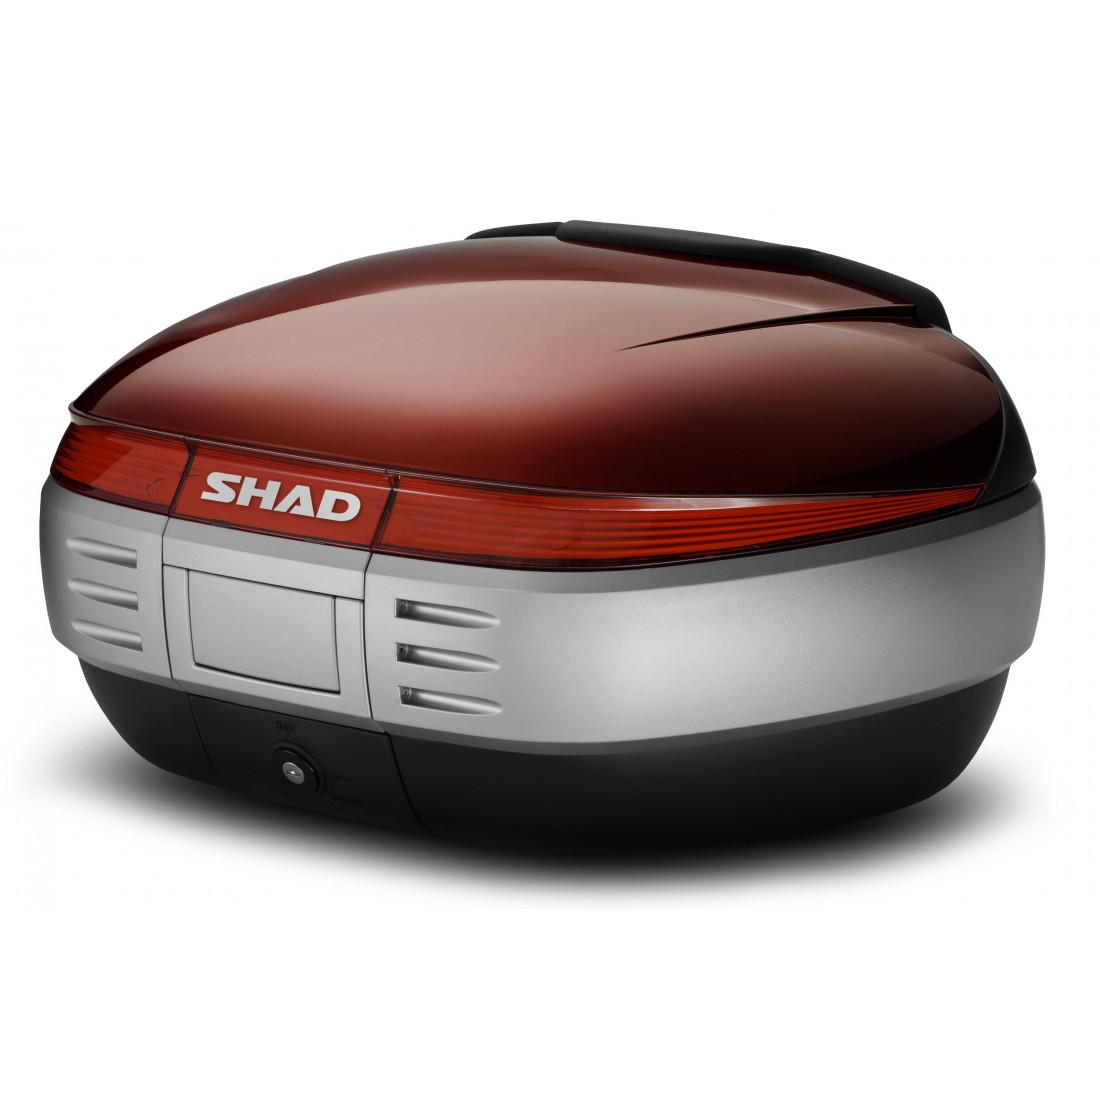 Tapa Baúl Shad SH50 50lt Rojo